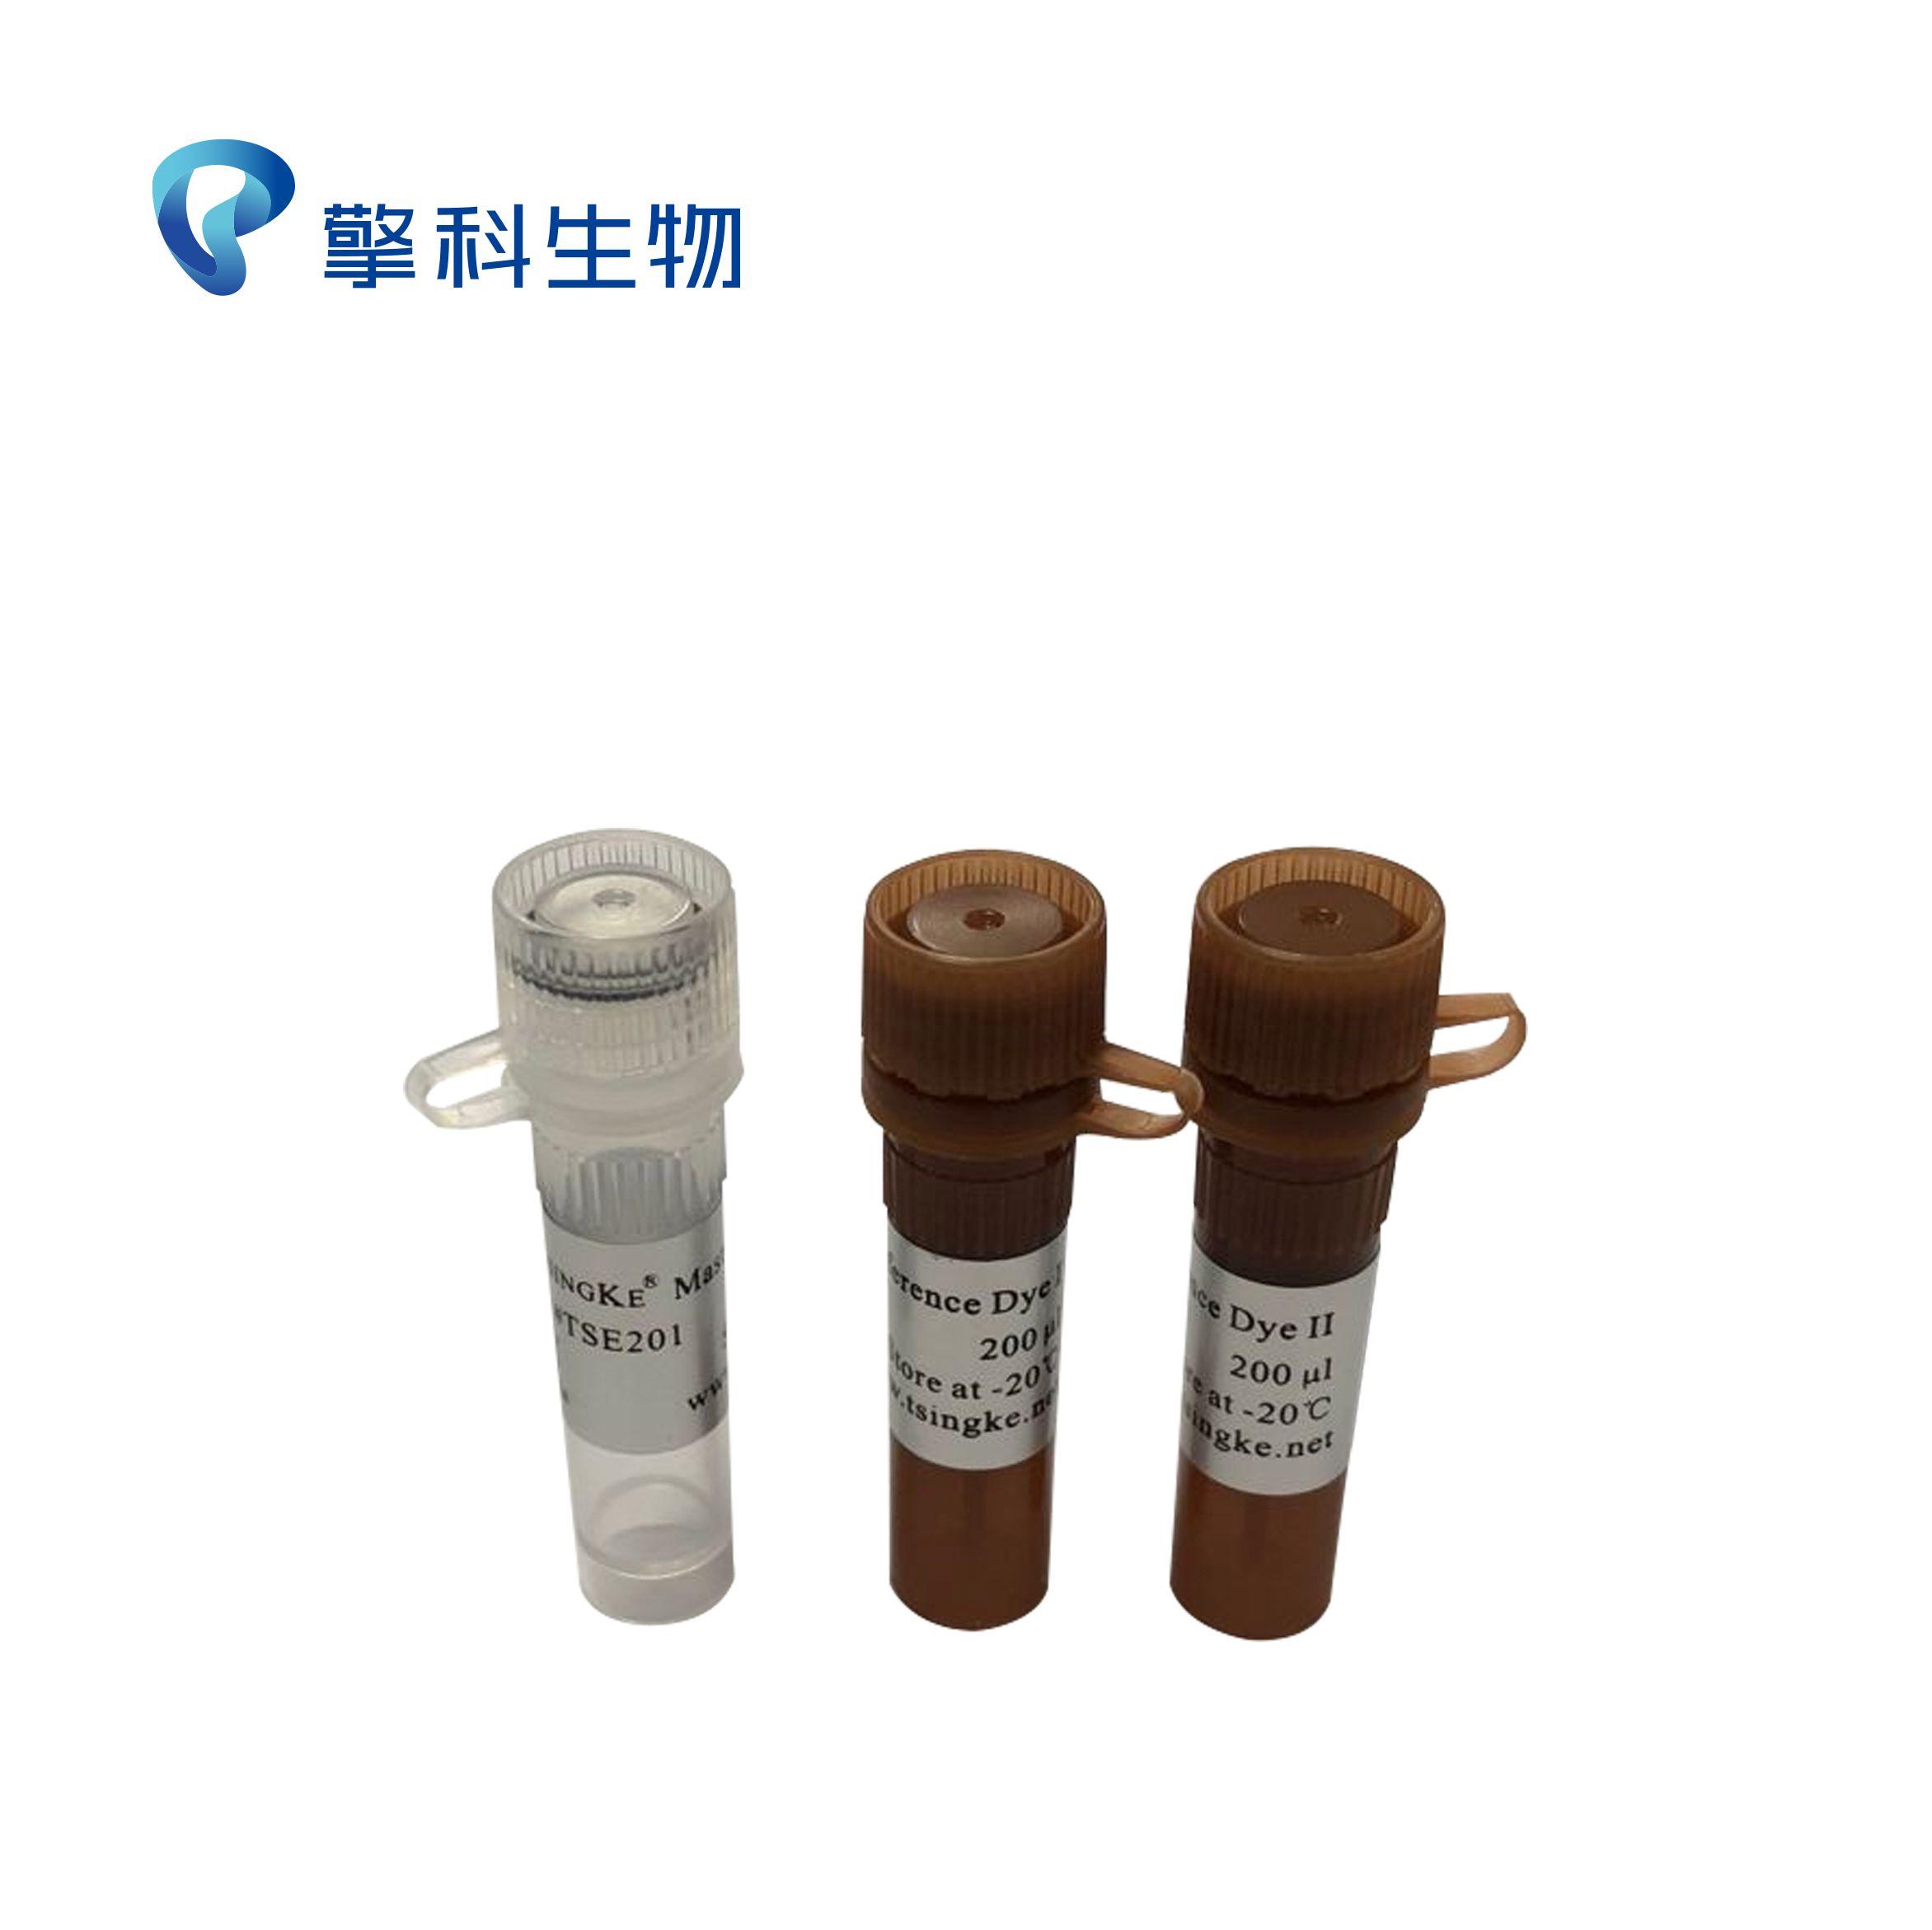 2×TSINGKE® Master qPCR Mix(SYBR Green I)/荧光定量系列/擎科生物TSINGKE